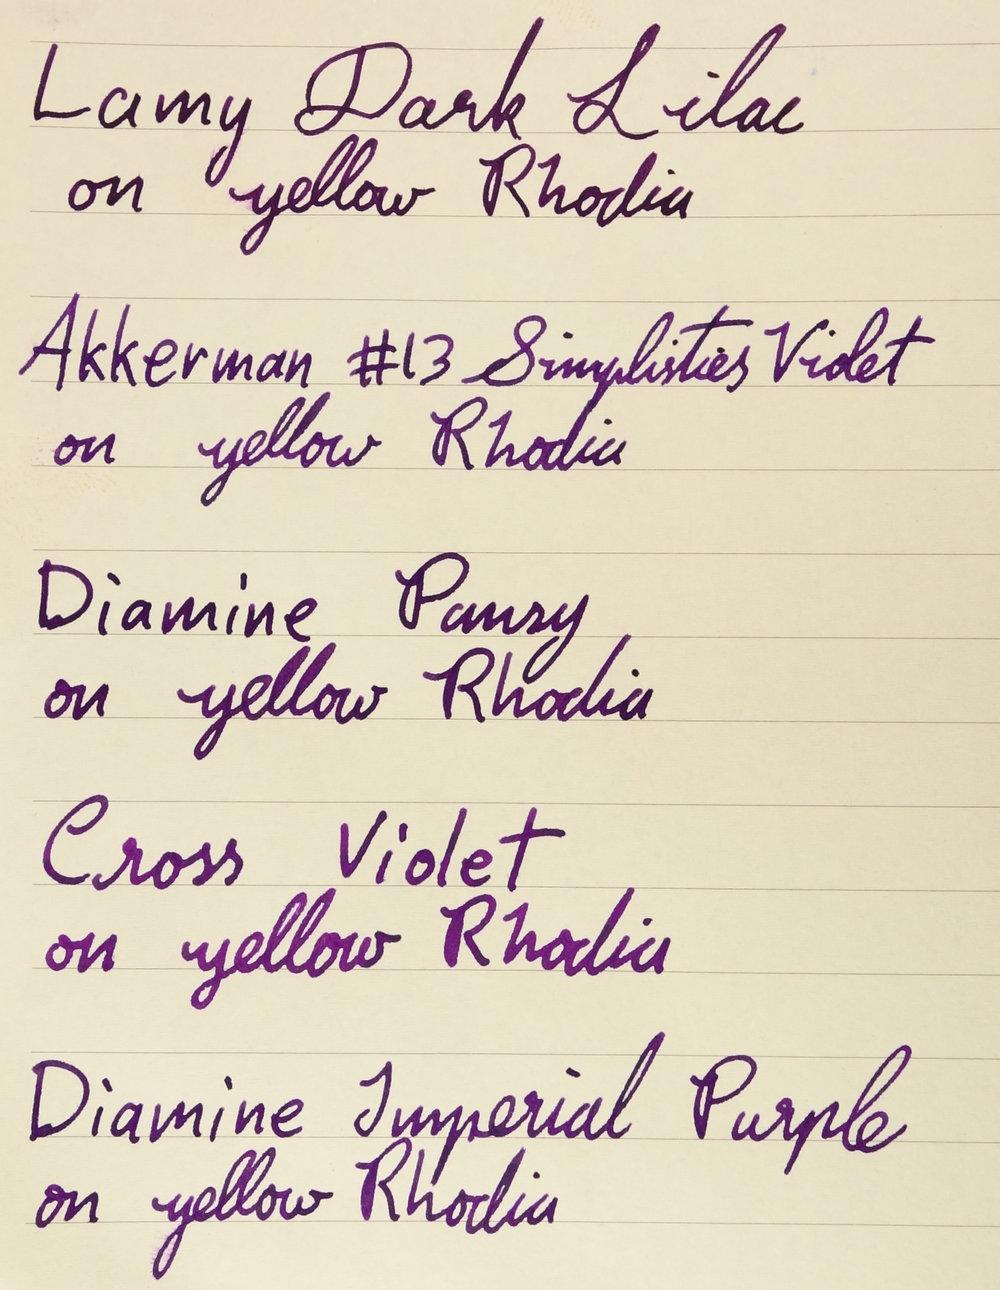 On Yellow Rhodia